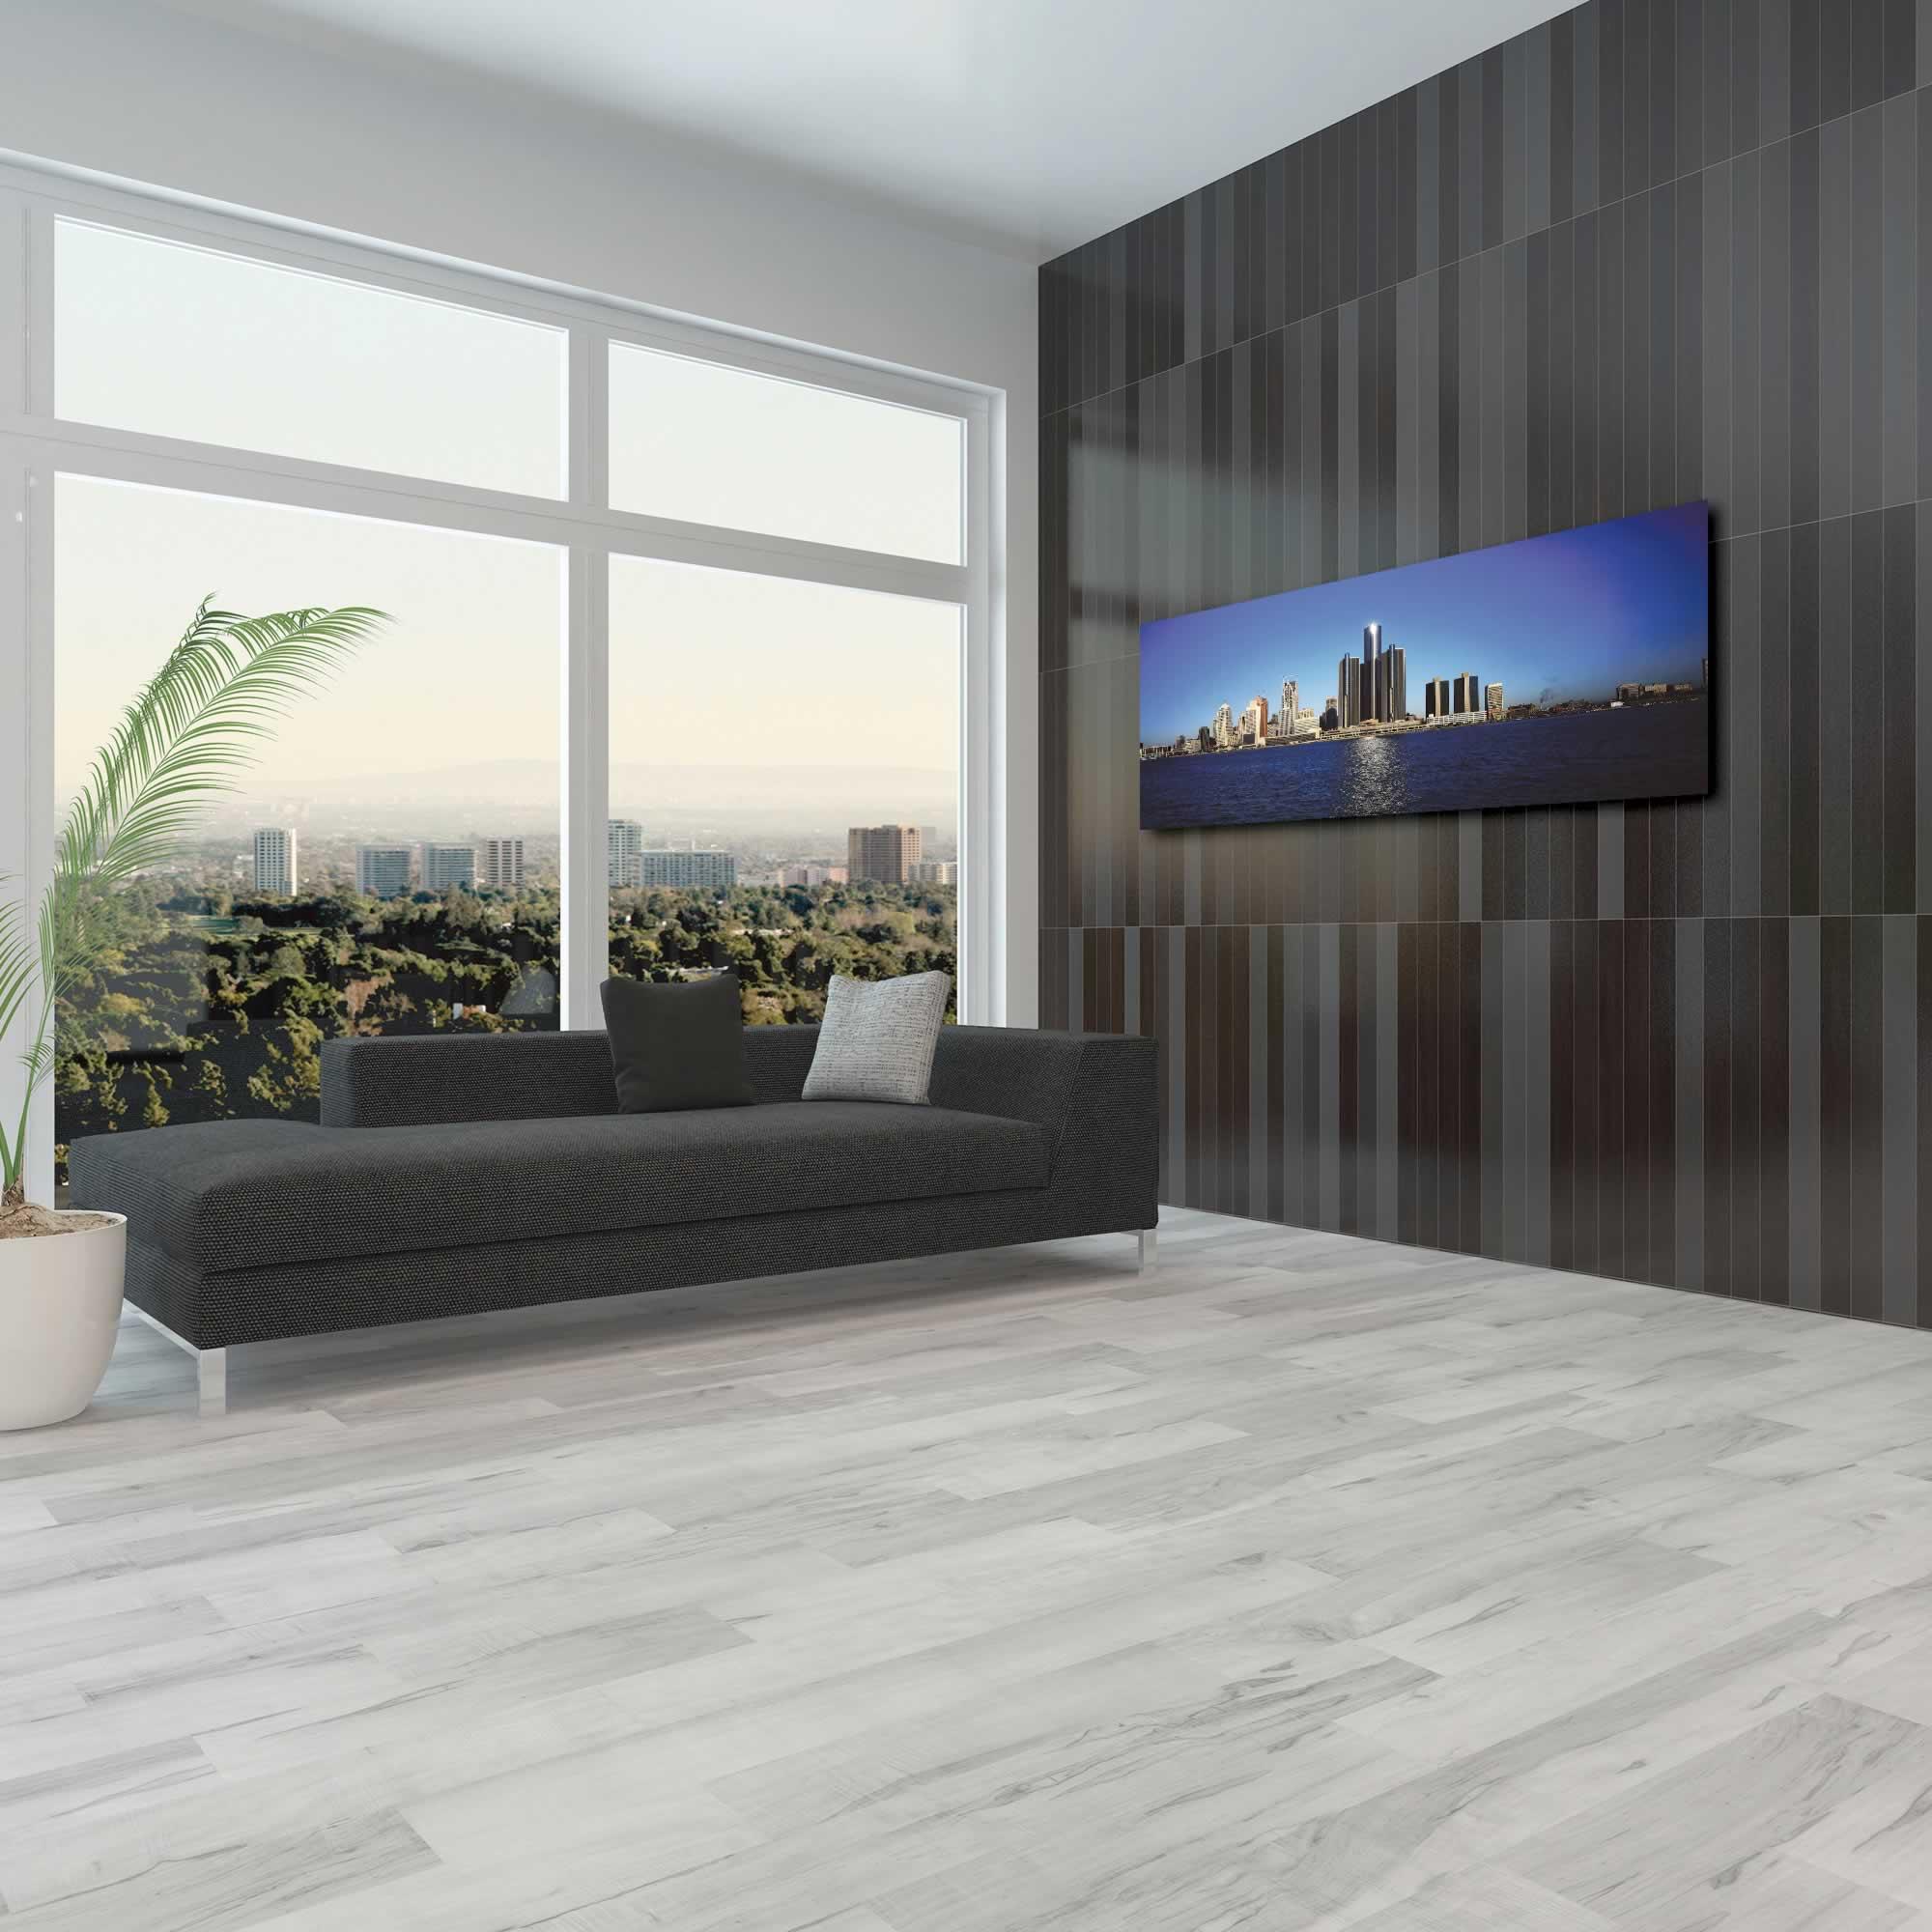 Detroit City Skyline - Urban Modern Art, Designer Home Decor, Cityscape Wall Artwork, Trendy Contemporary Art - Alternate View 3